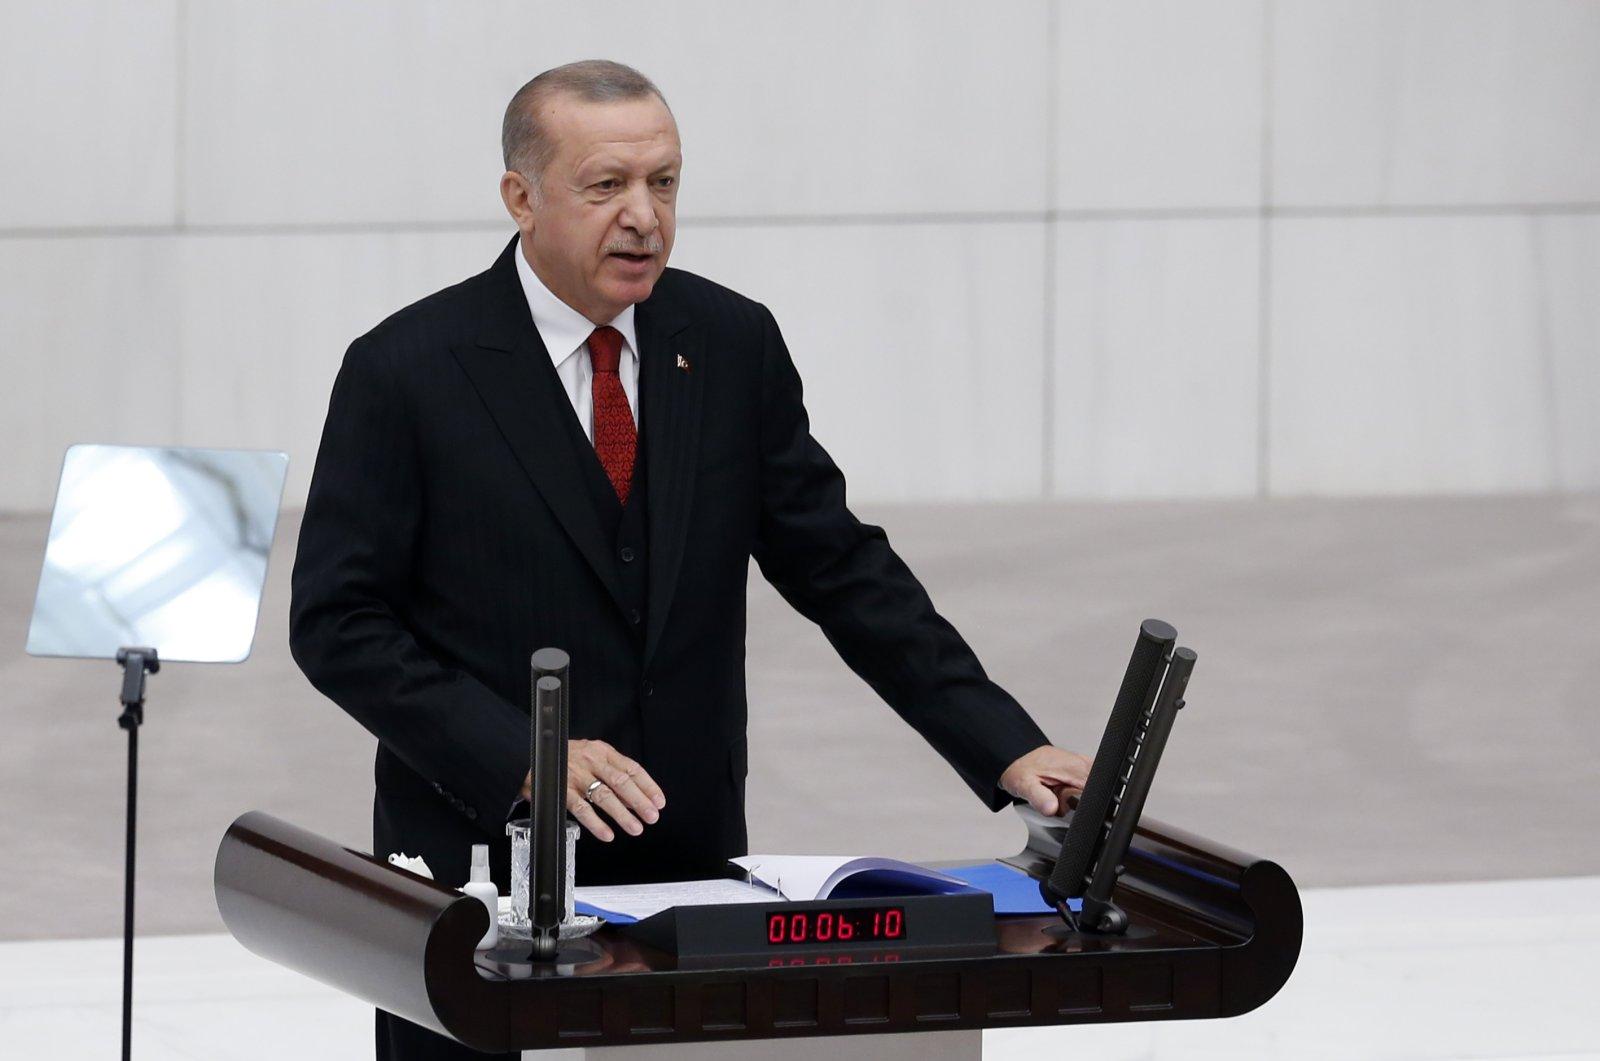 President Recep Tayyip Erdoğan speaks at the inauguration ceremony of the fourth legislative session of the Turkish Parliament in Ankara, Turkey, Oct. 1, 2020. (AA Photo)